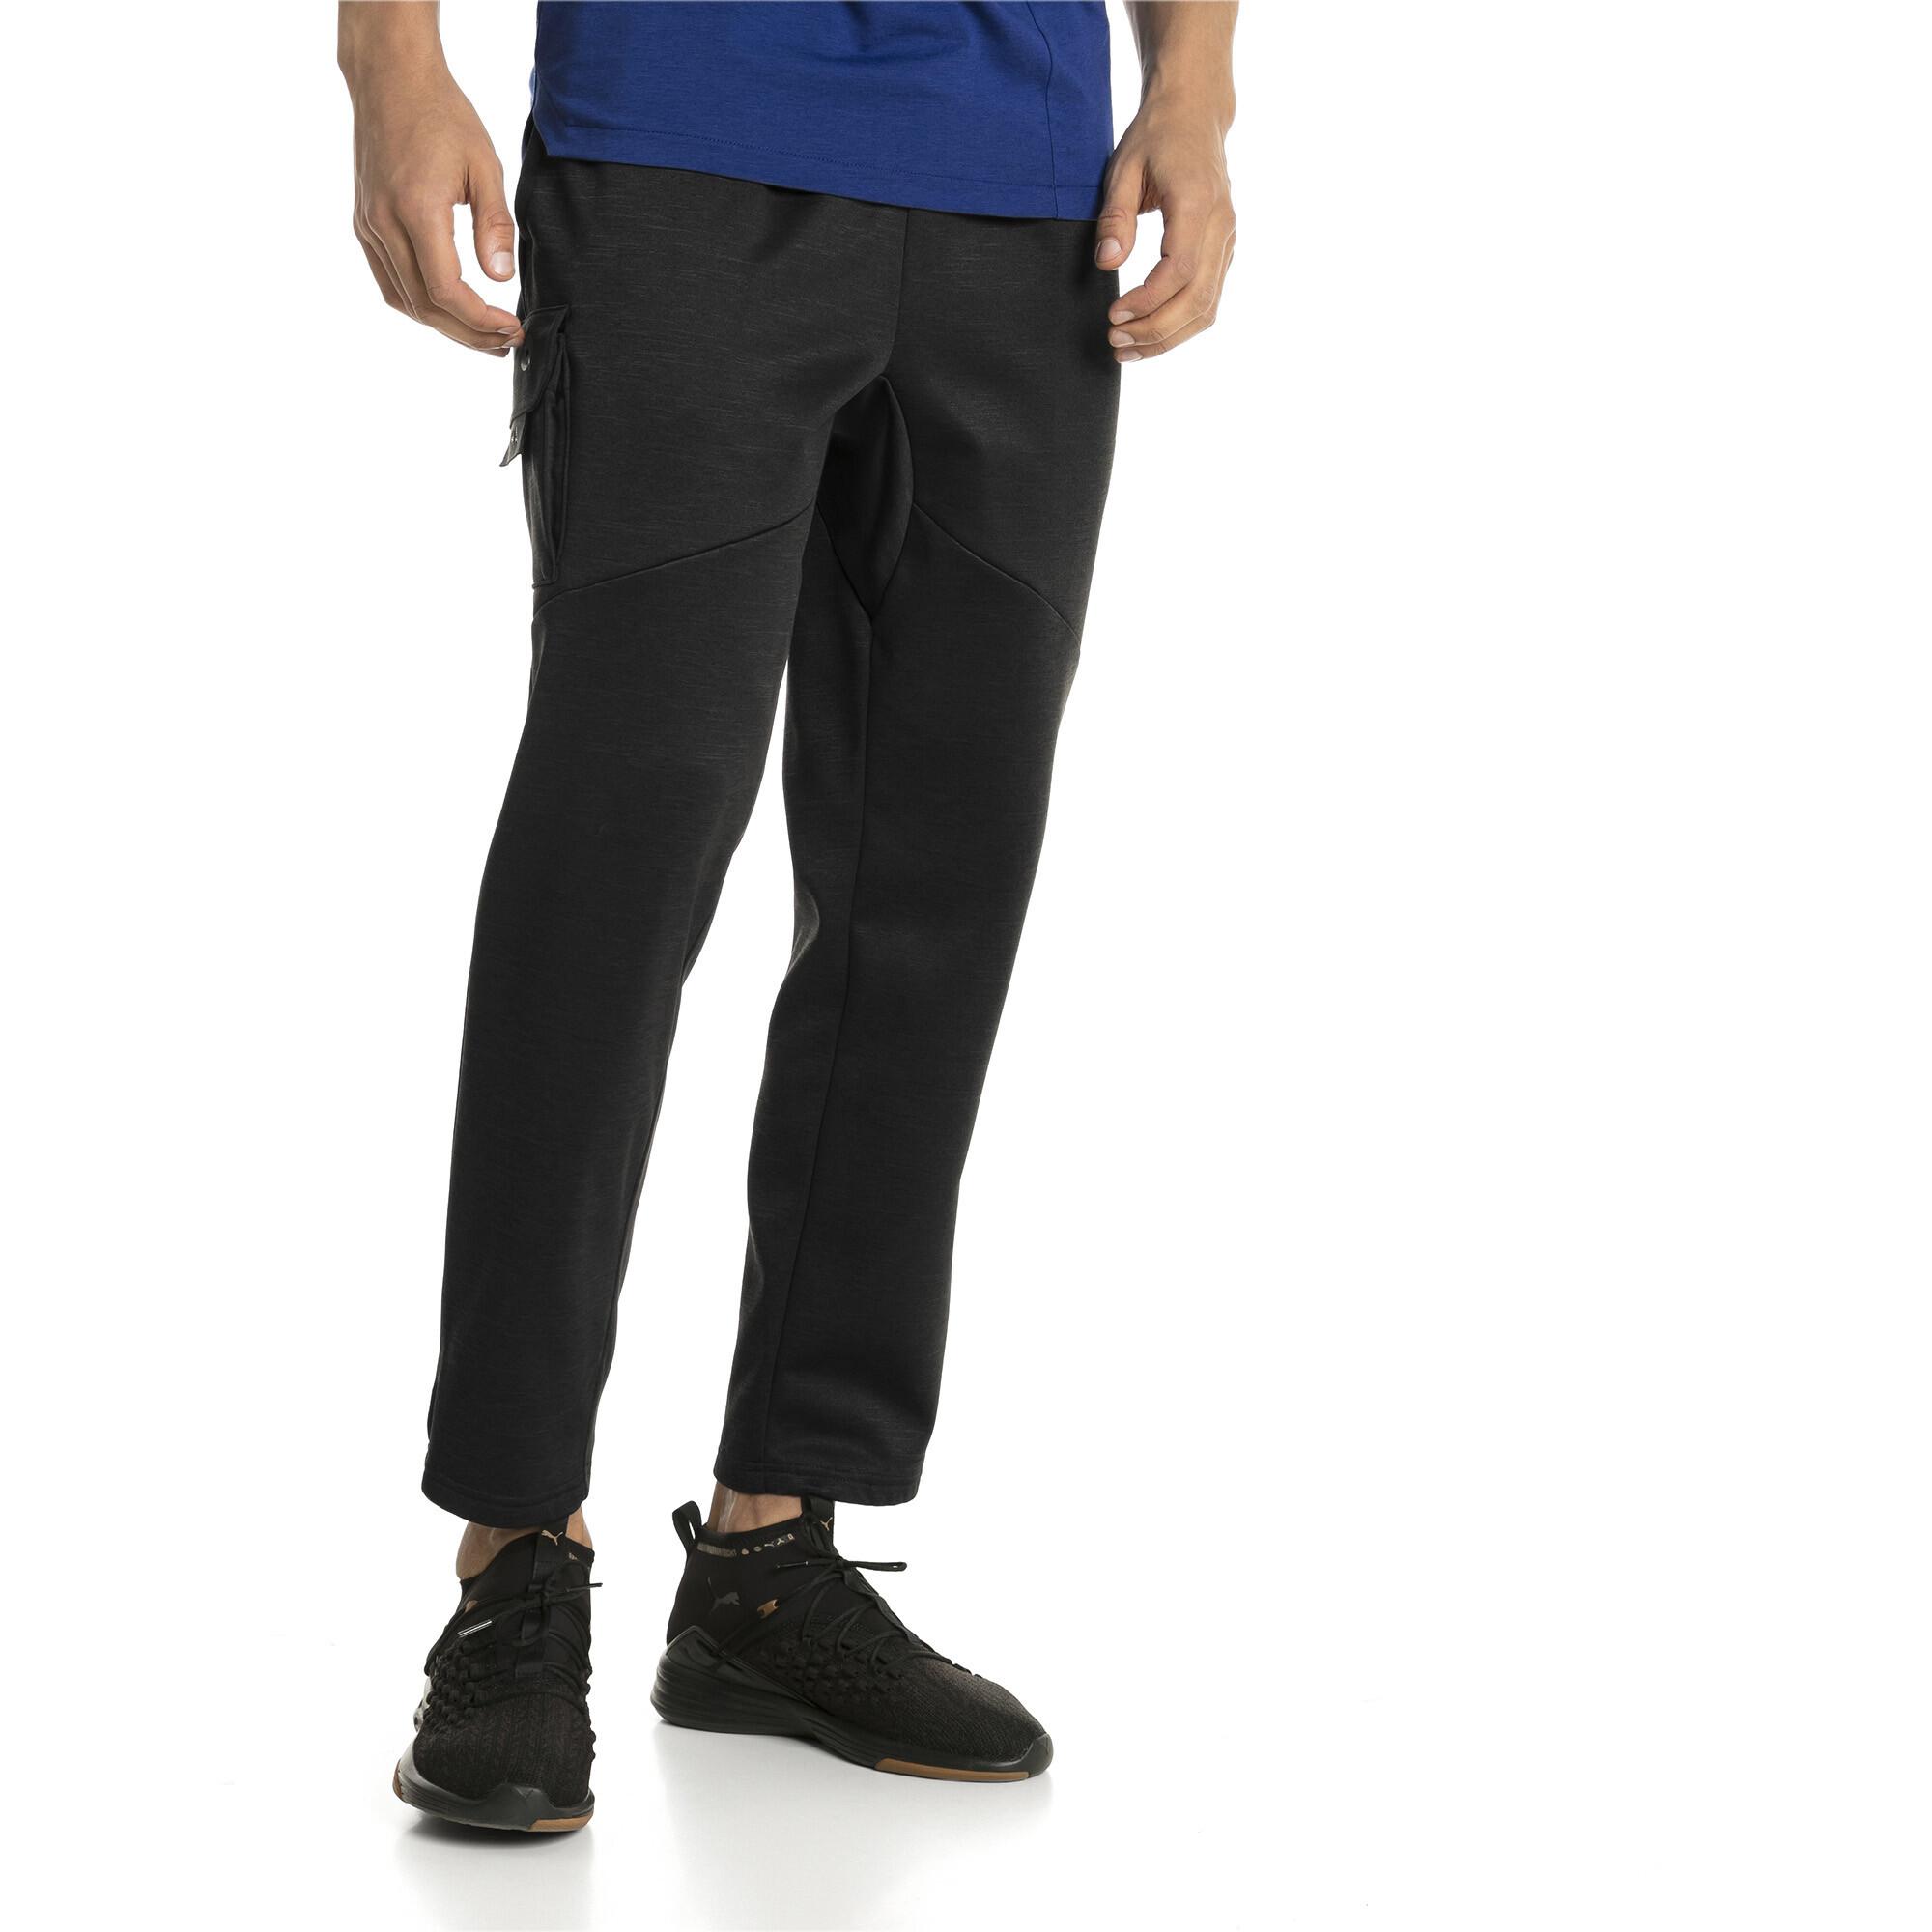 Image Puma BND Tech Trackster Men's Sweatpants #1